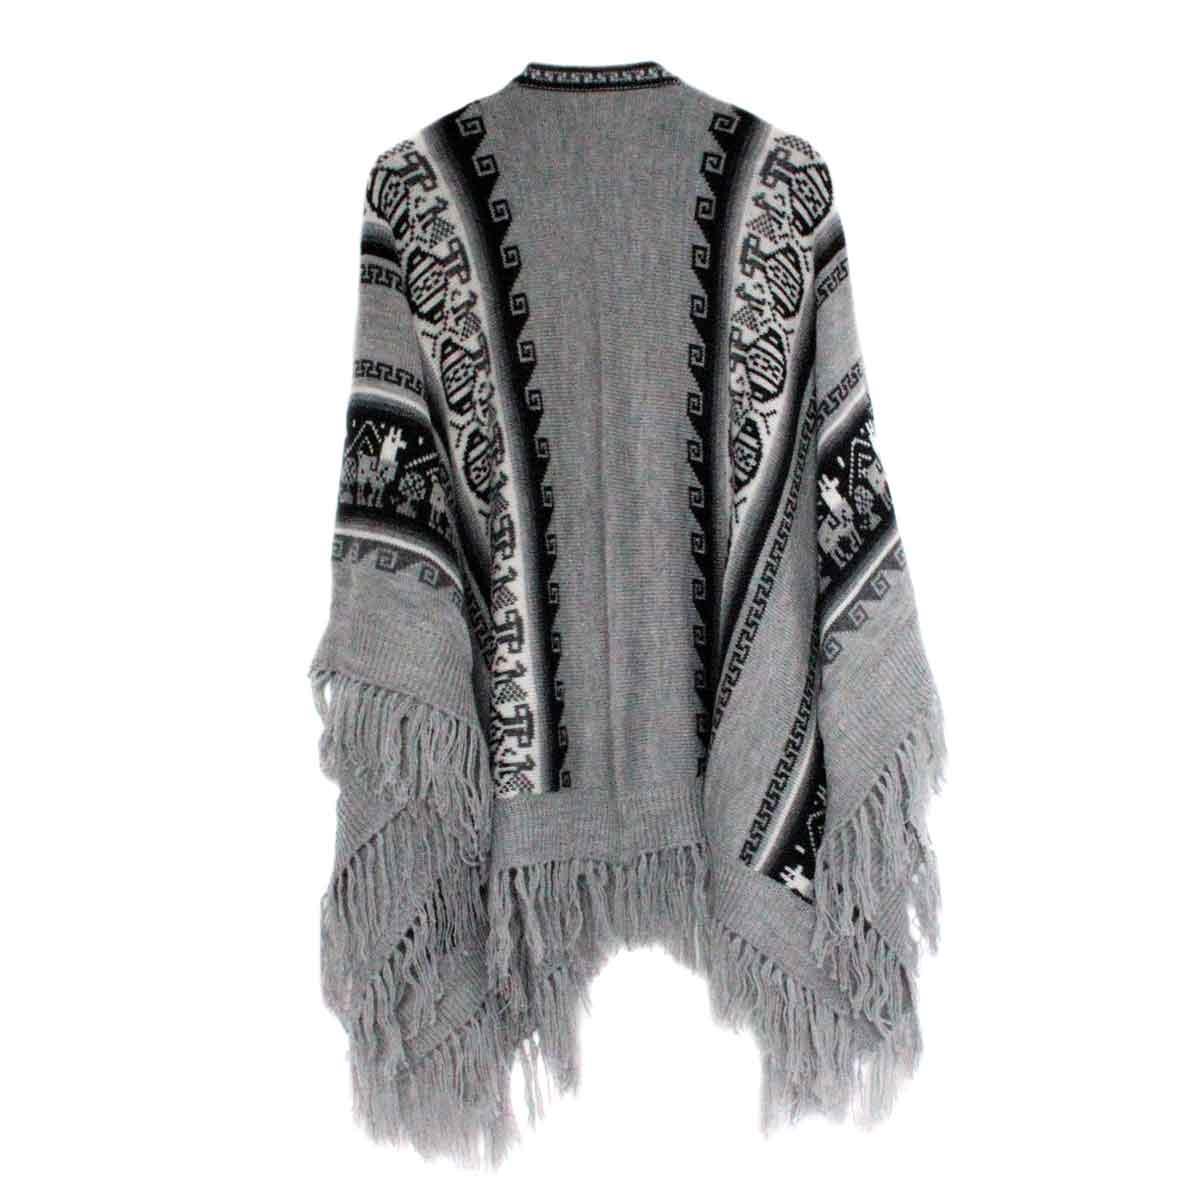 Inka-Products-Poncho Alpaga JAYWAY-Gris Motifs Ethniques-2